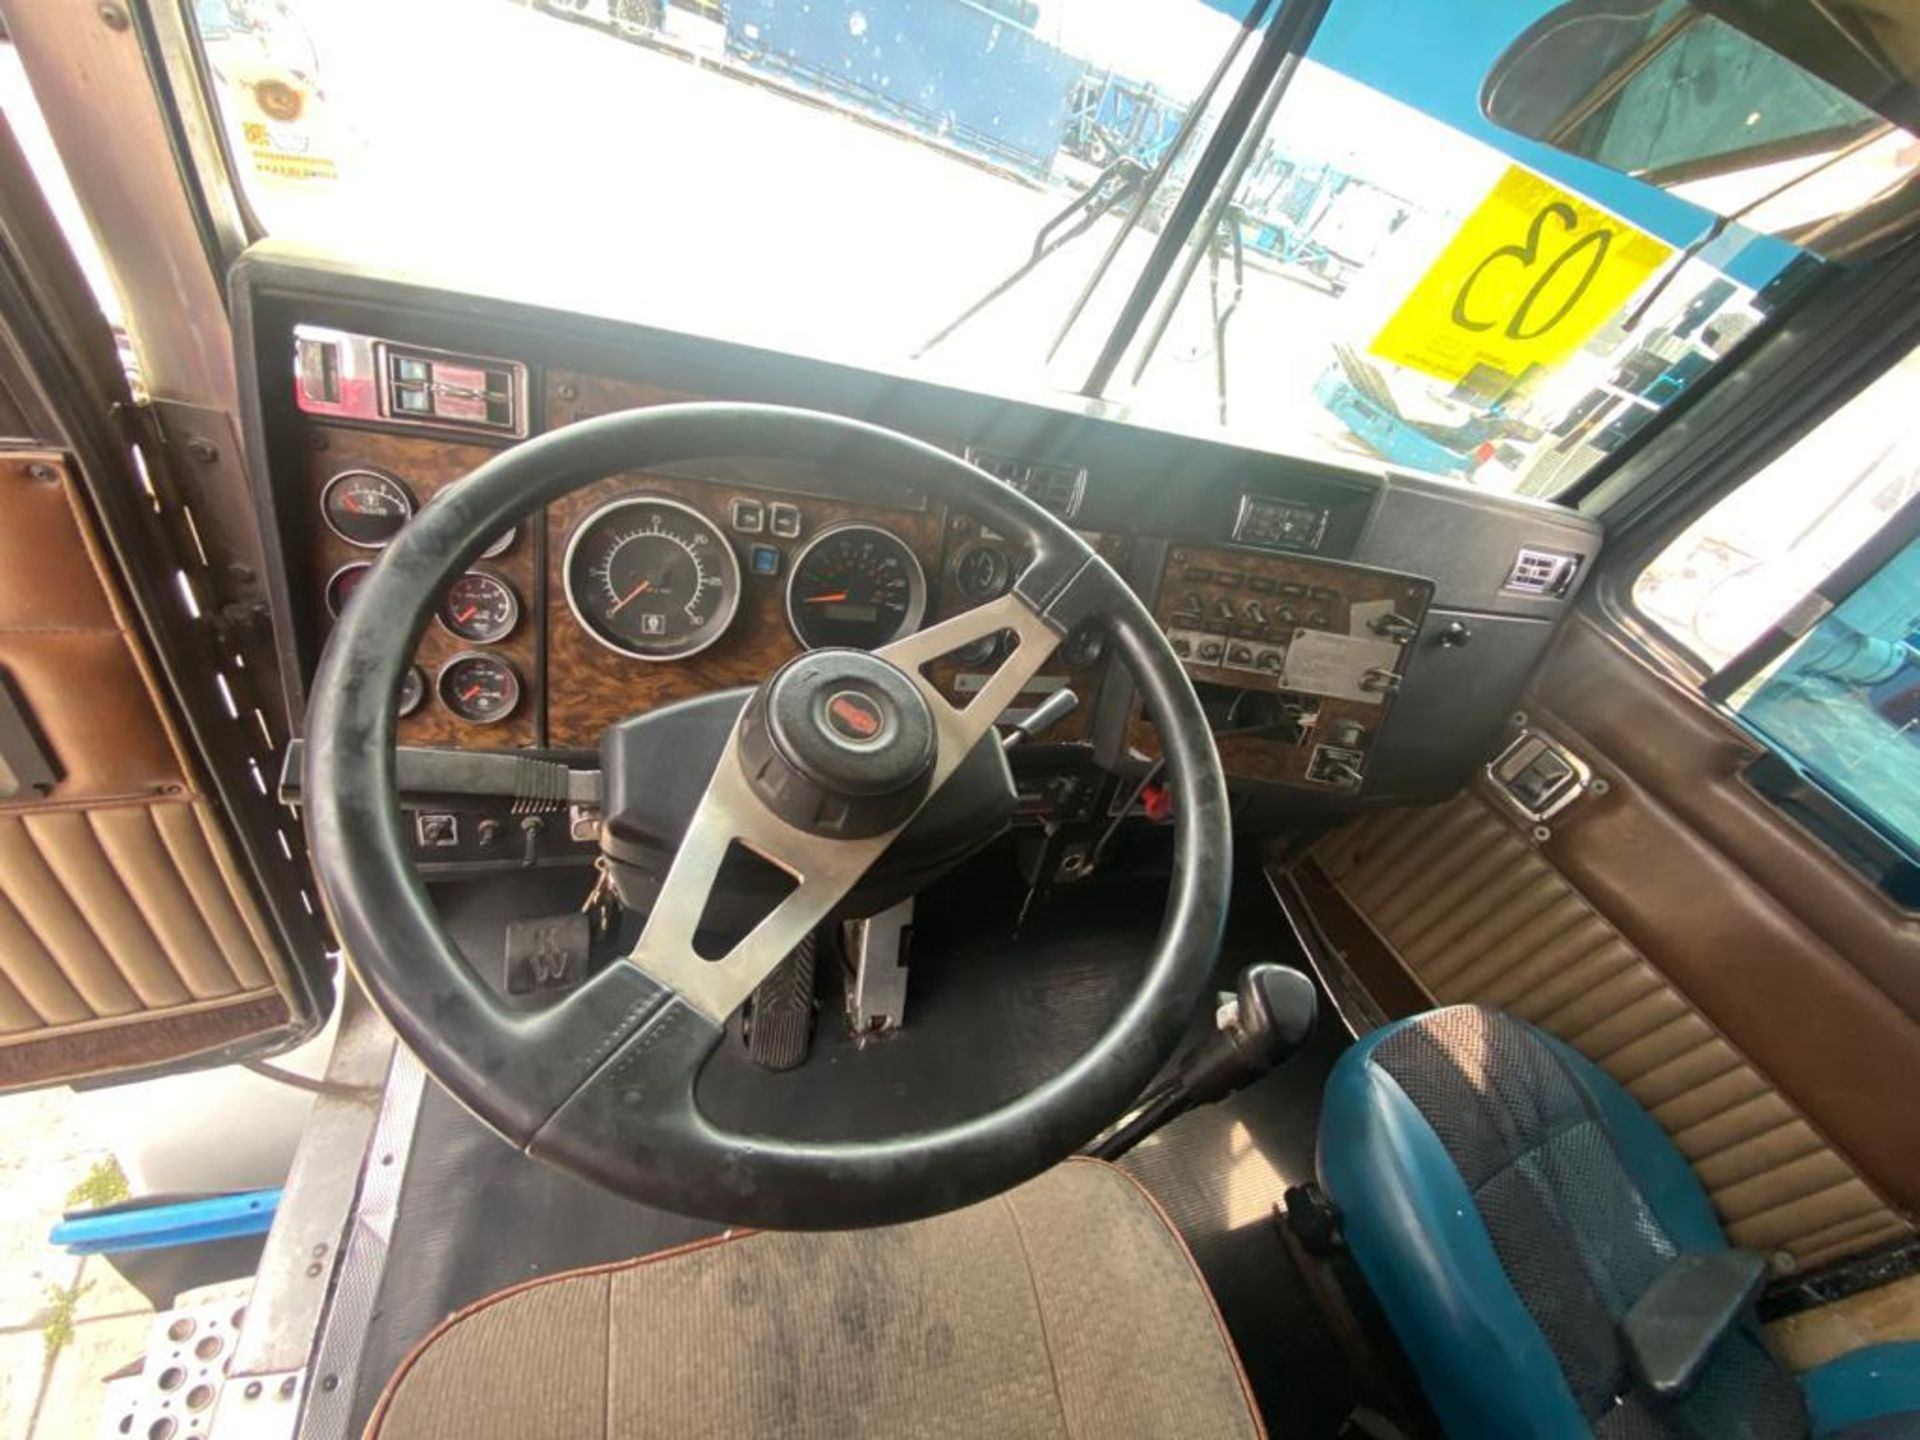 1999 Kenworth Sleeper truck tractor, standard transmission of 18 speeds - Image 39 of 62